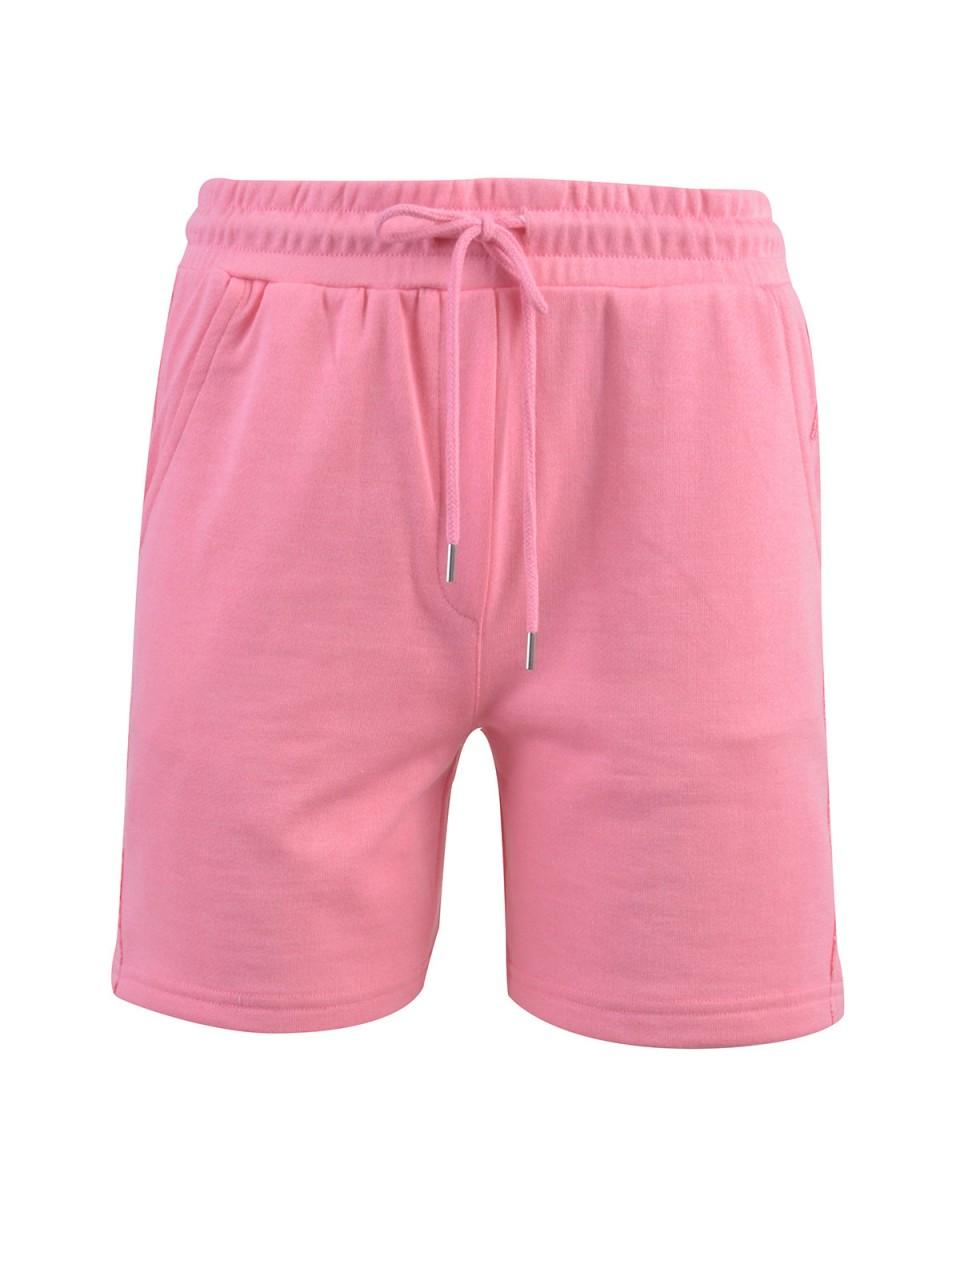 Hosen - SMITH SOUL Damen Shorts, pink  - Onlineshop Designermode.com